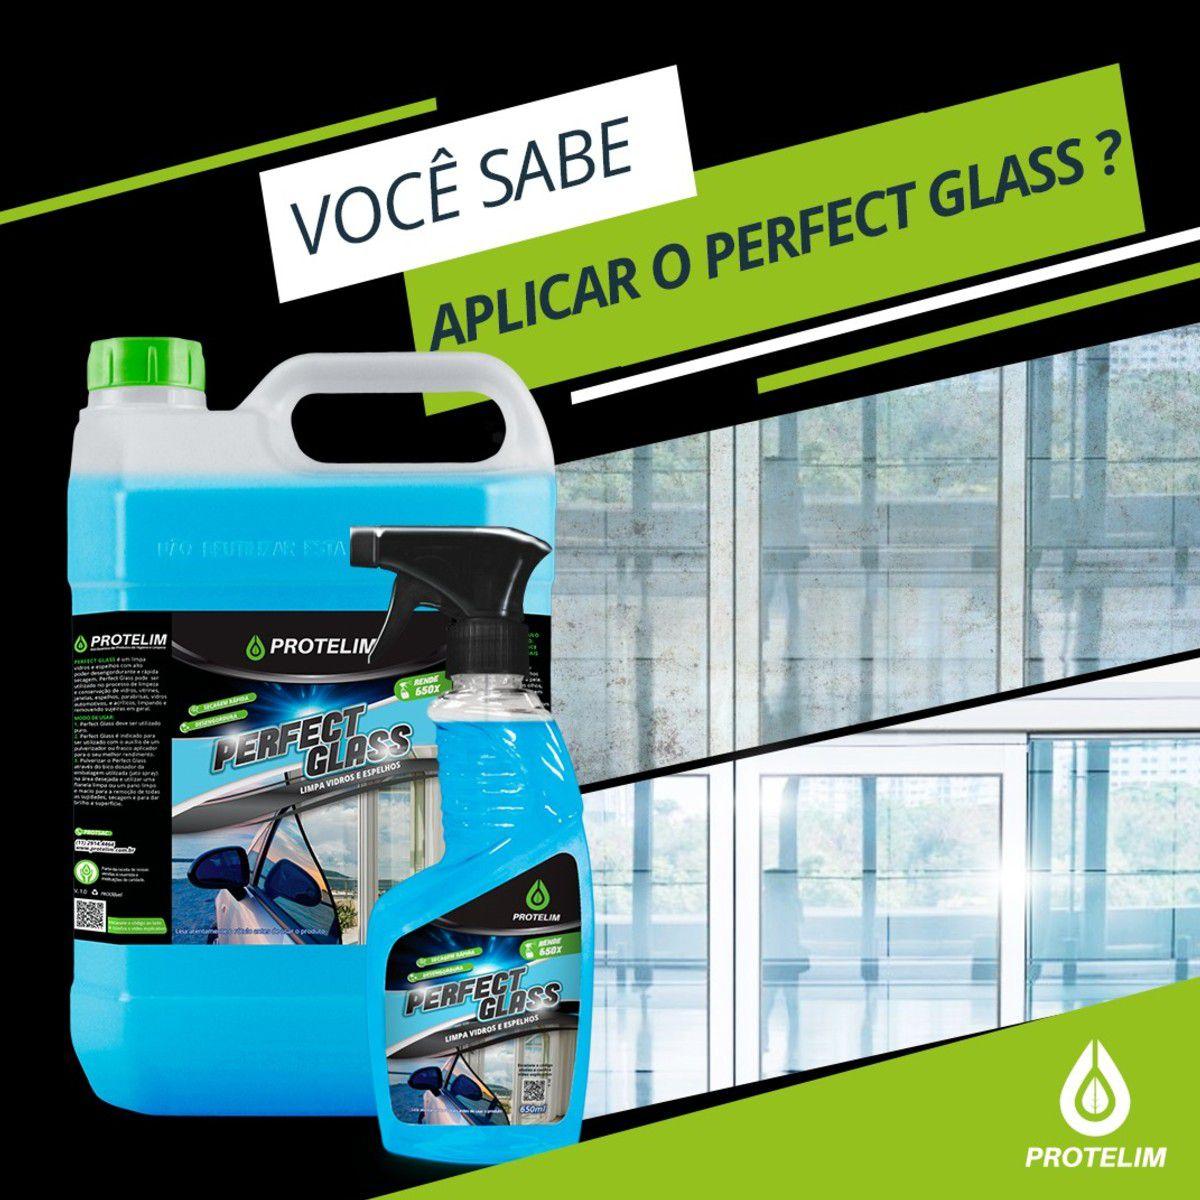 Kit Protelim Prot Vidro Perfect Glass + Pano Limpa Vidro